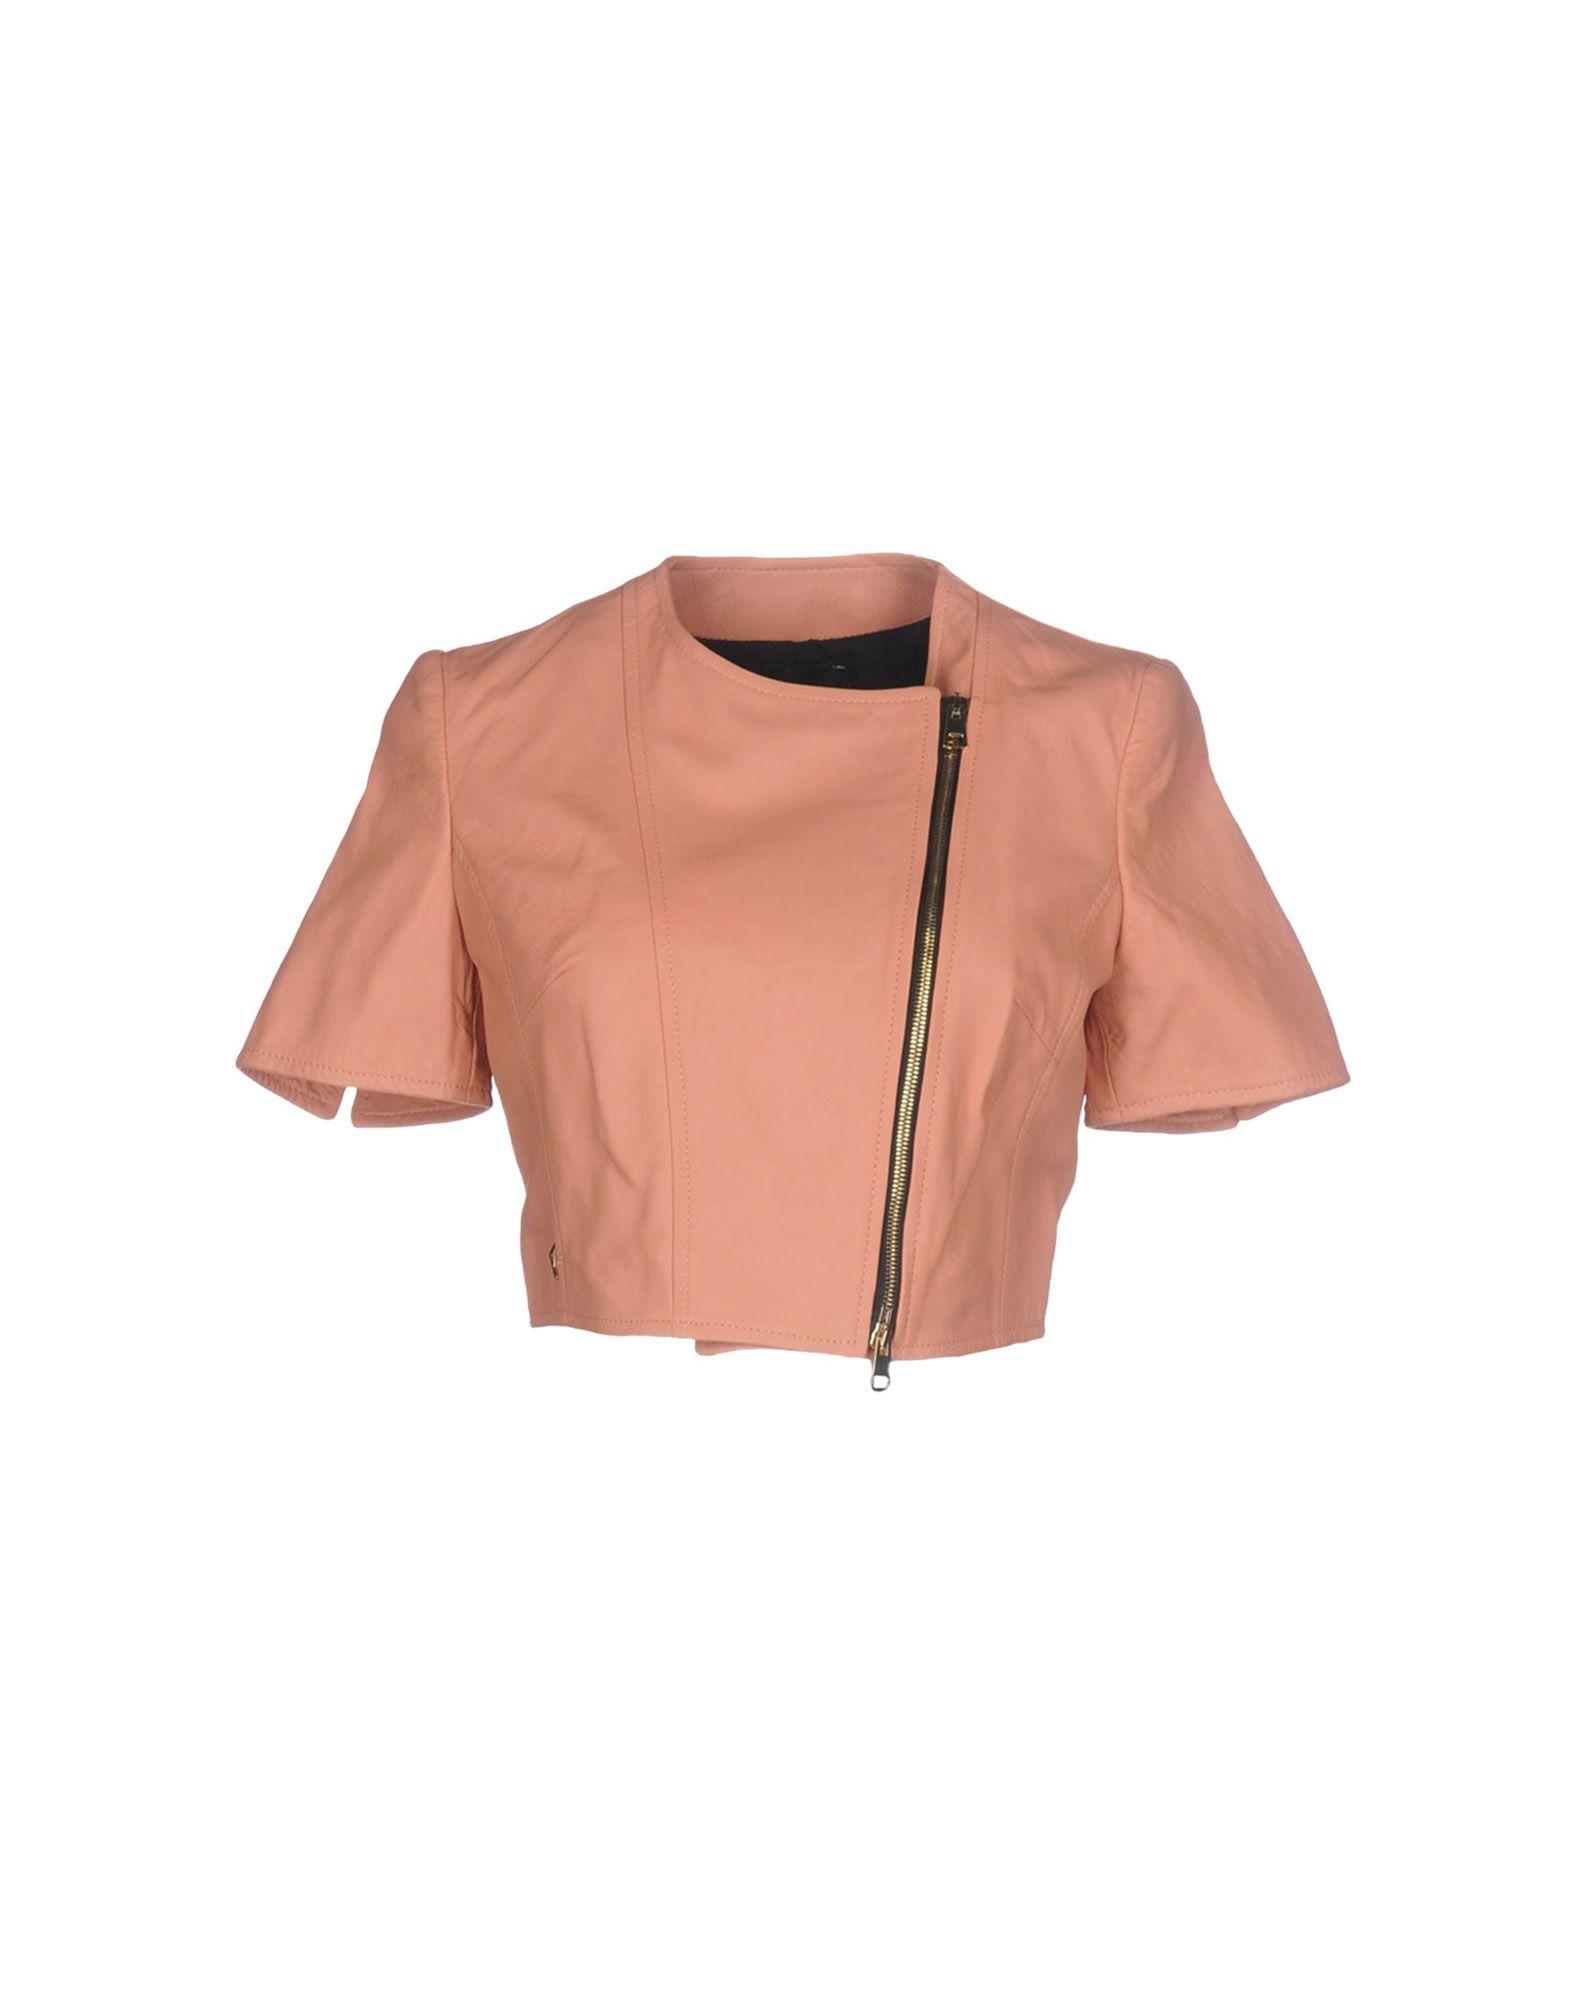 ATOS LOMBARDINI Biker Jacket in Pink